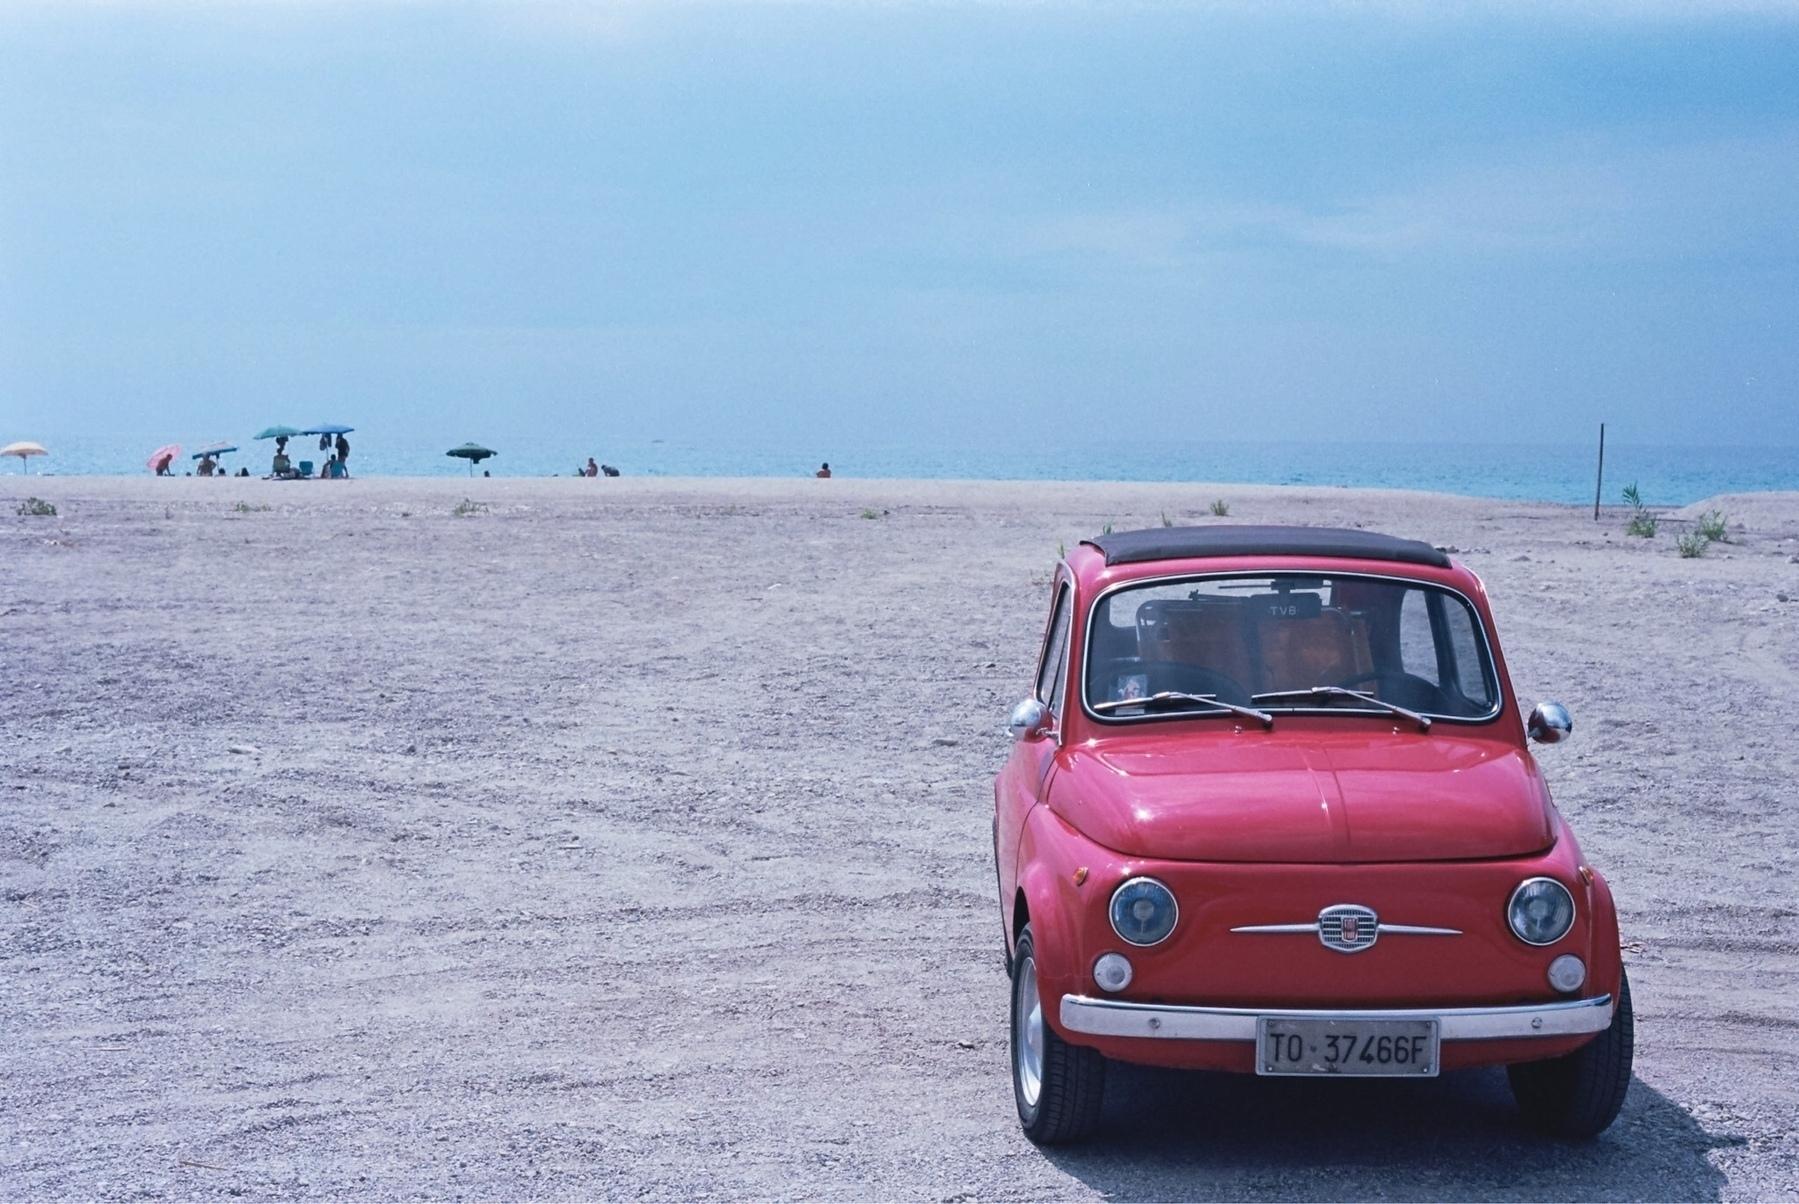 A classic Fiat sitting on an Italian beach.